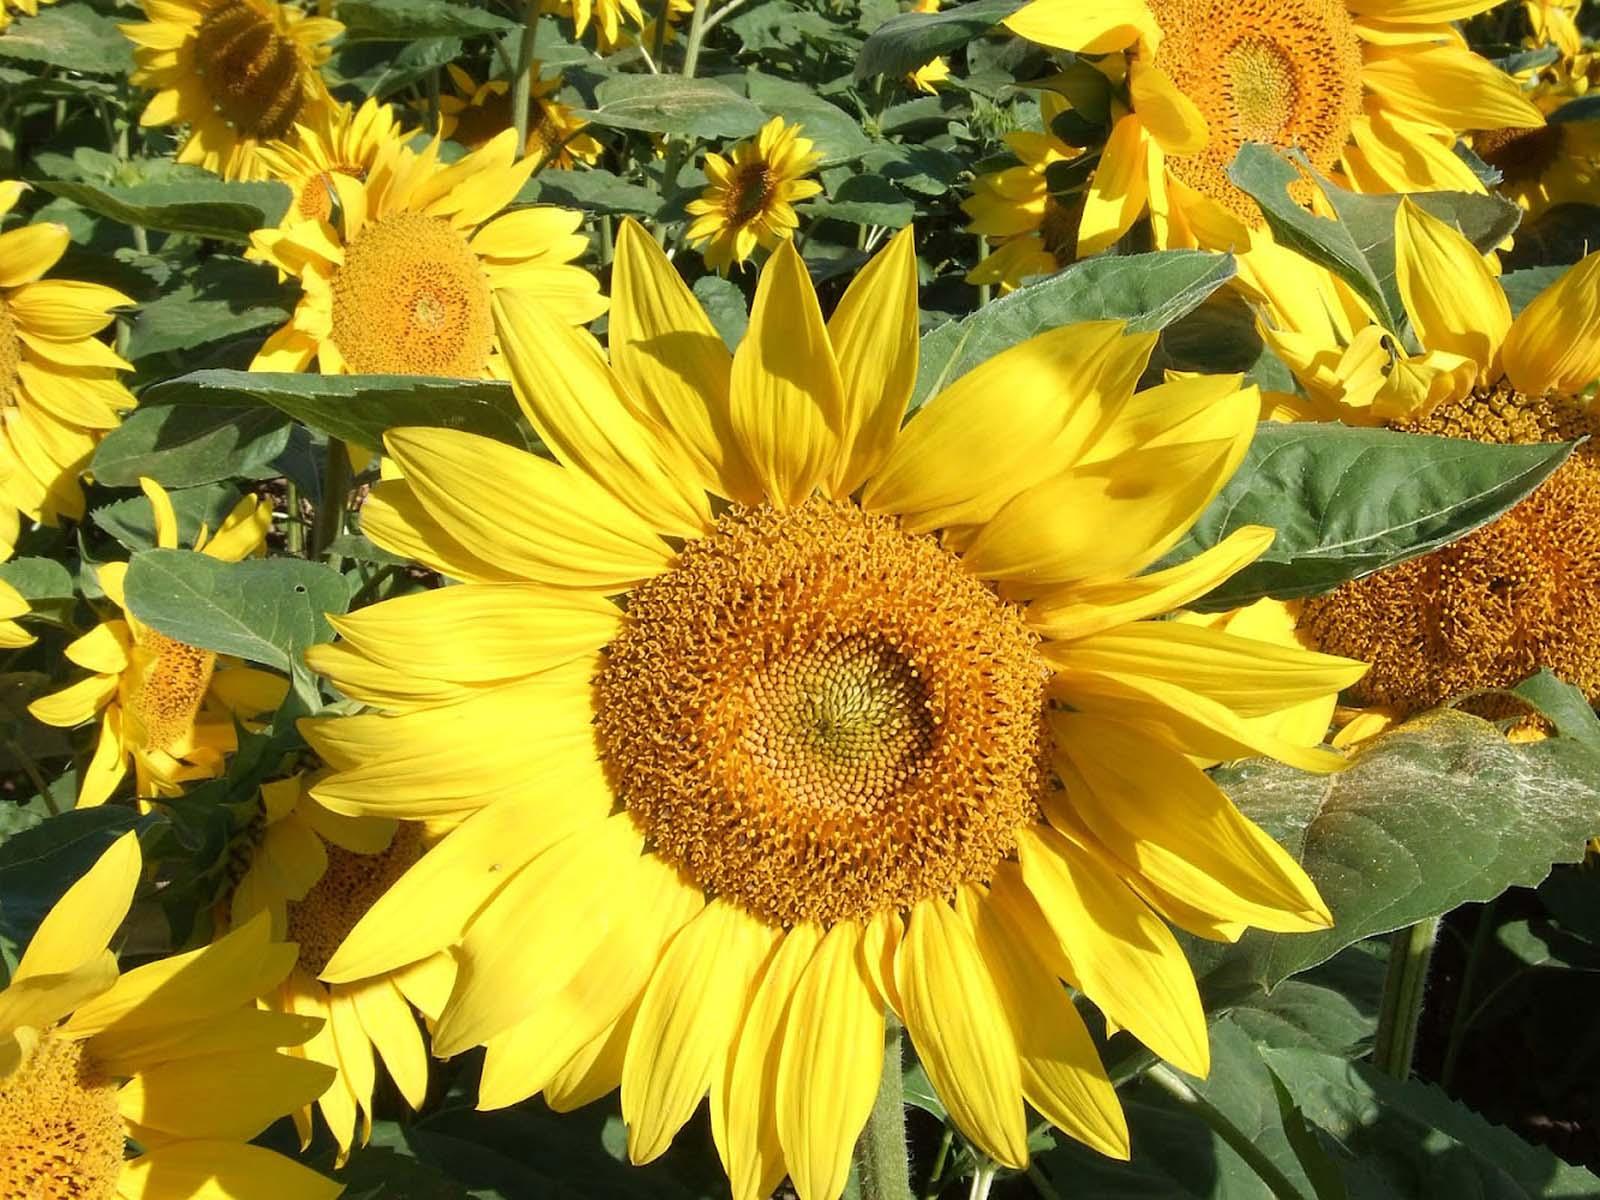 HD Wallpapers: Sunflower Beautiful Wallpapers